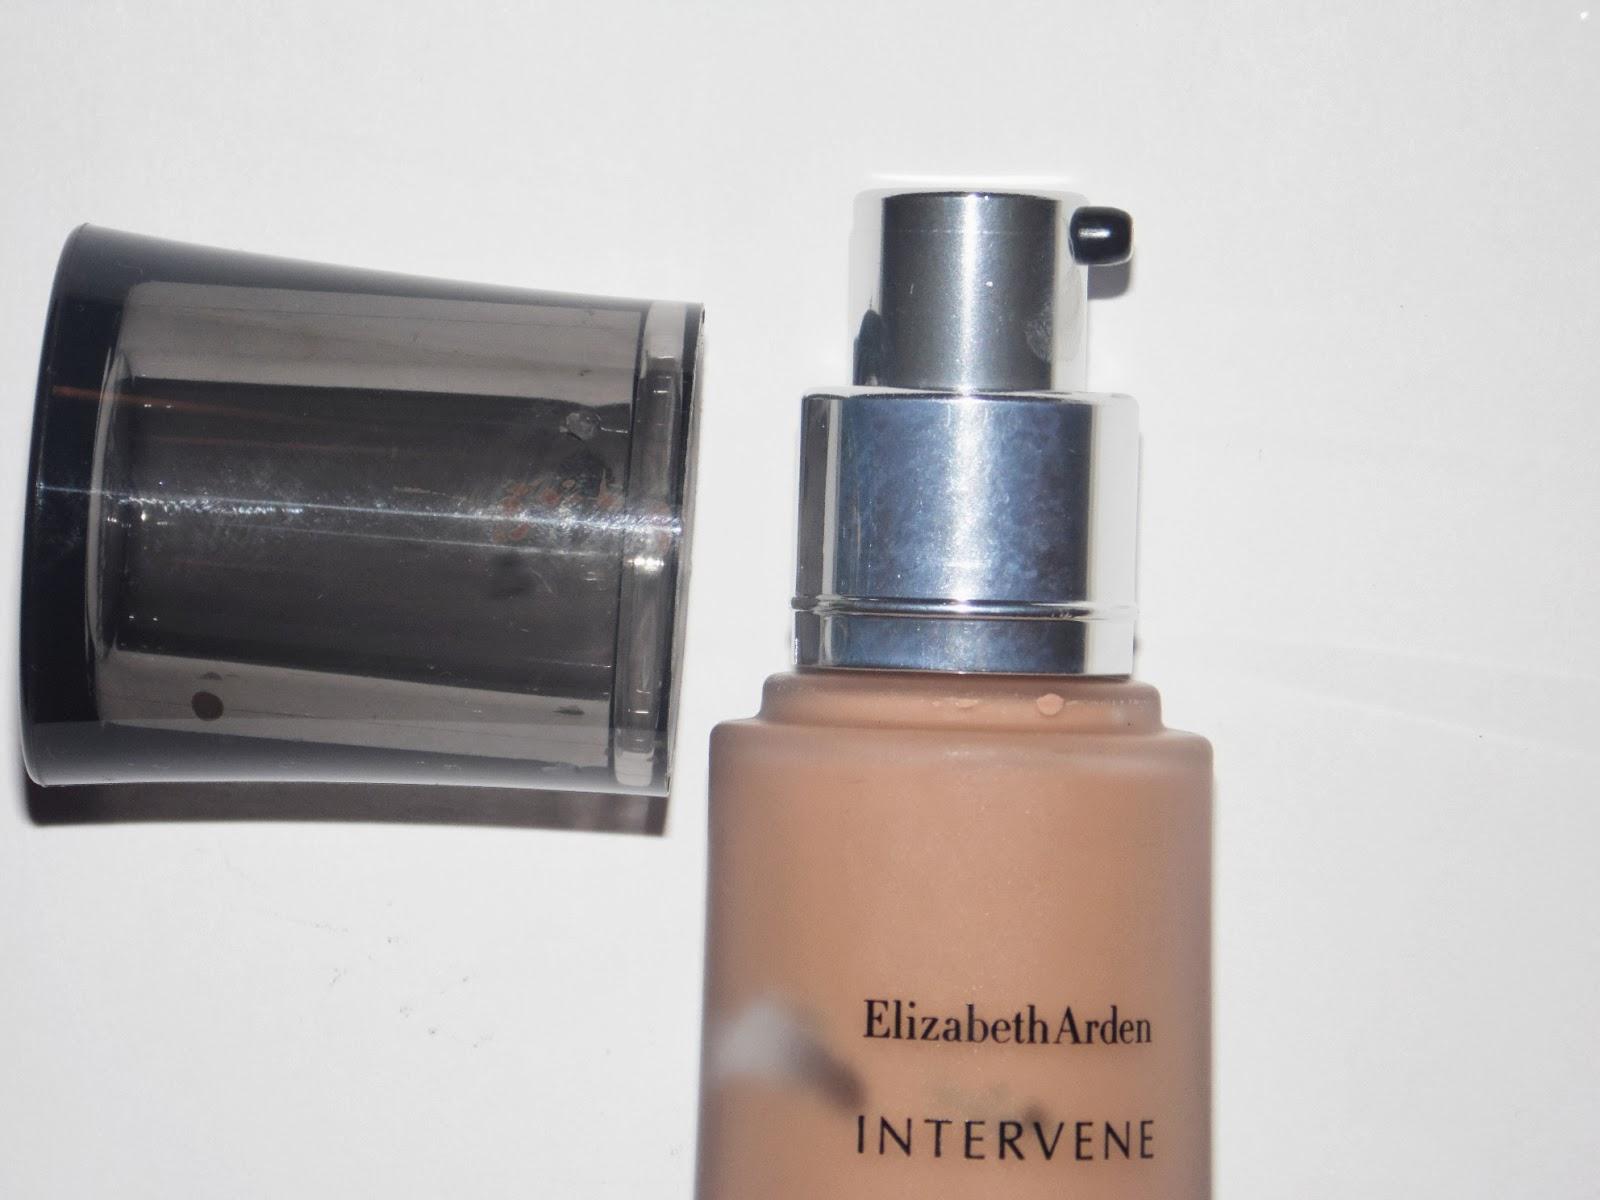 Elizabeth Arden Intervene make-up SPF 15 Для нормальной и ...